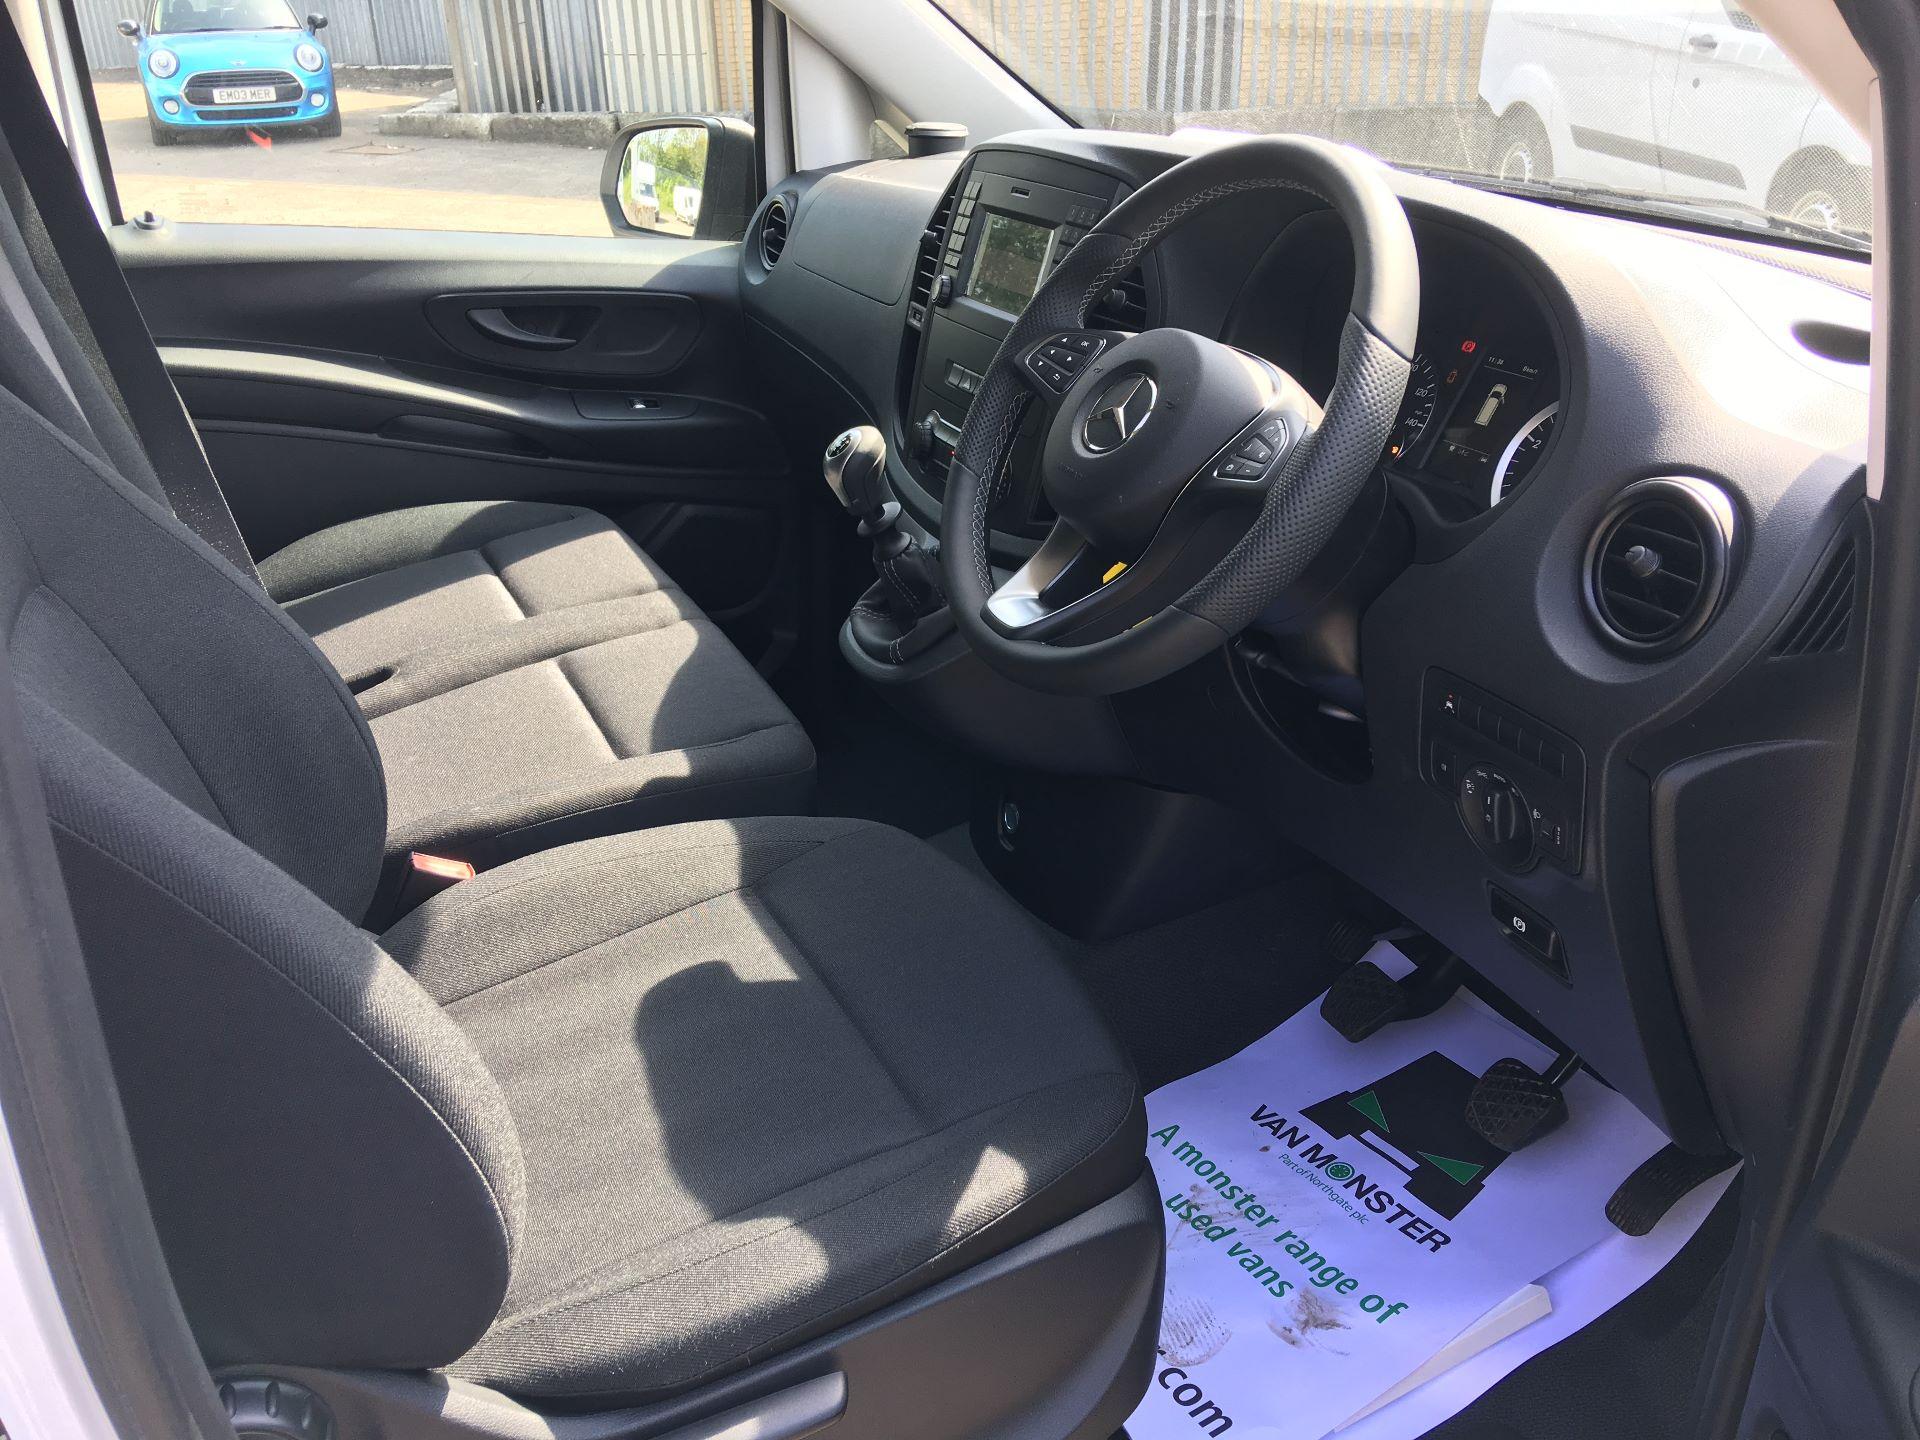 2019 Mercedes-Benz Vito LONG 111 CDI VAN EURO 5/6 (YN19ZGM) Image 2